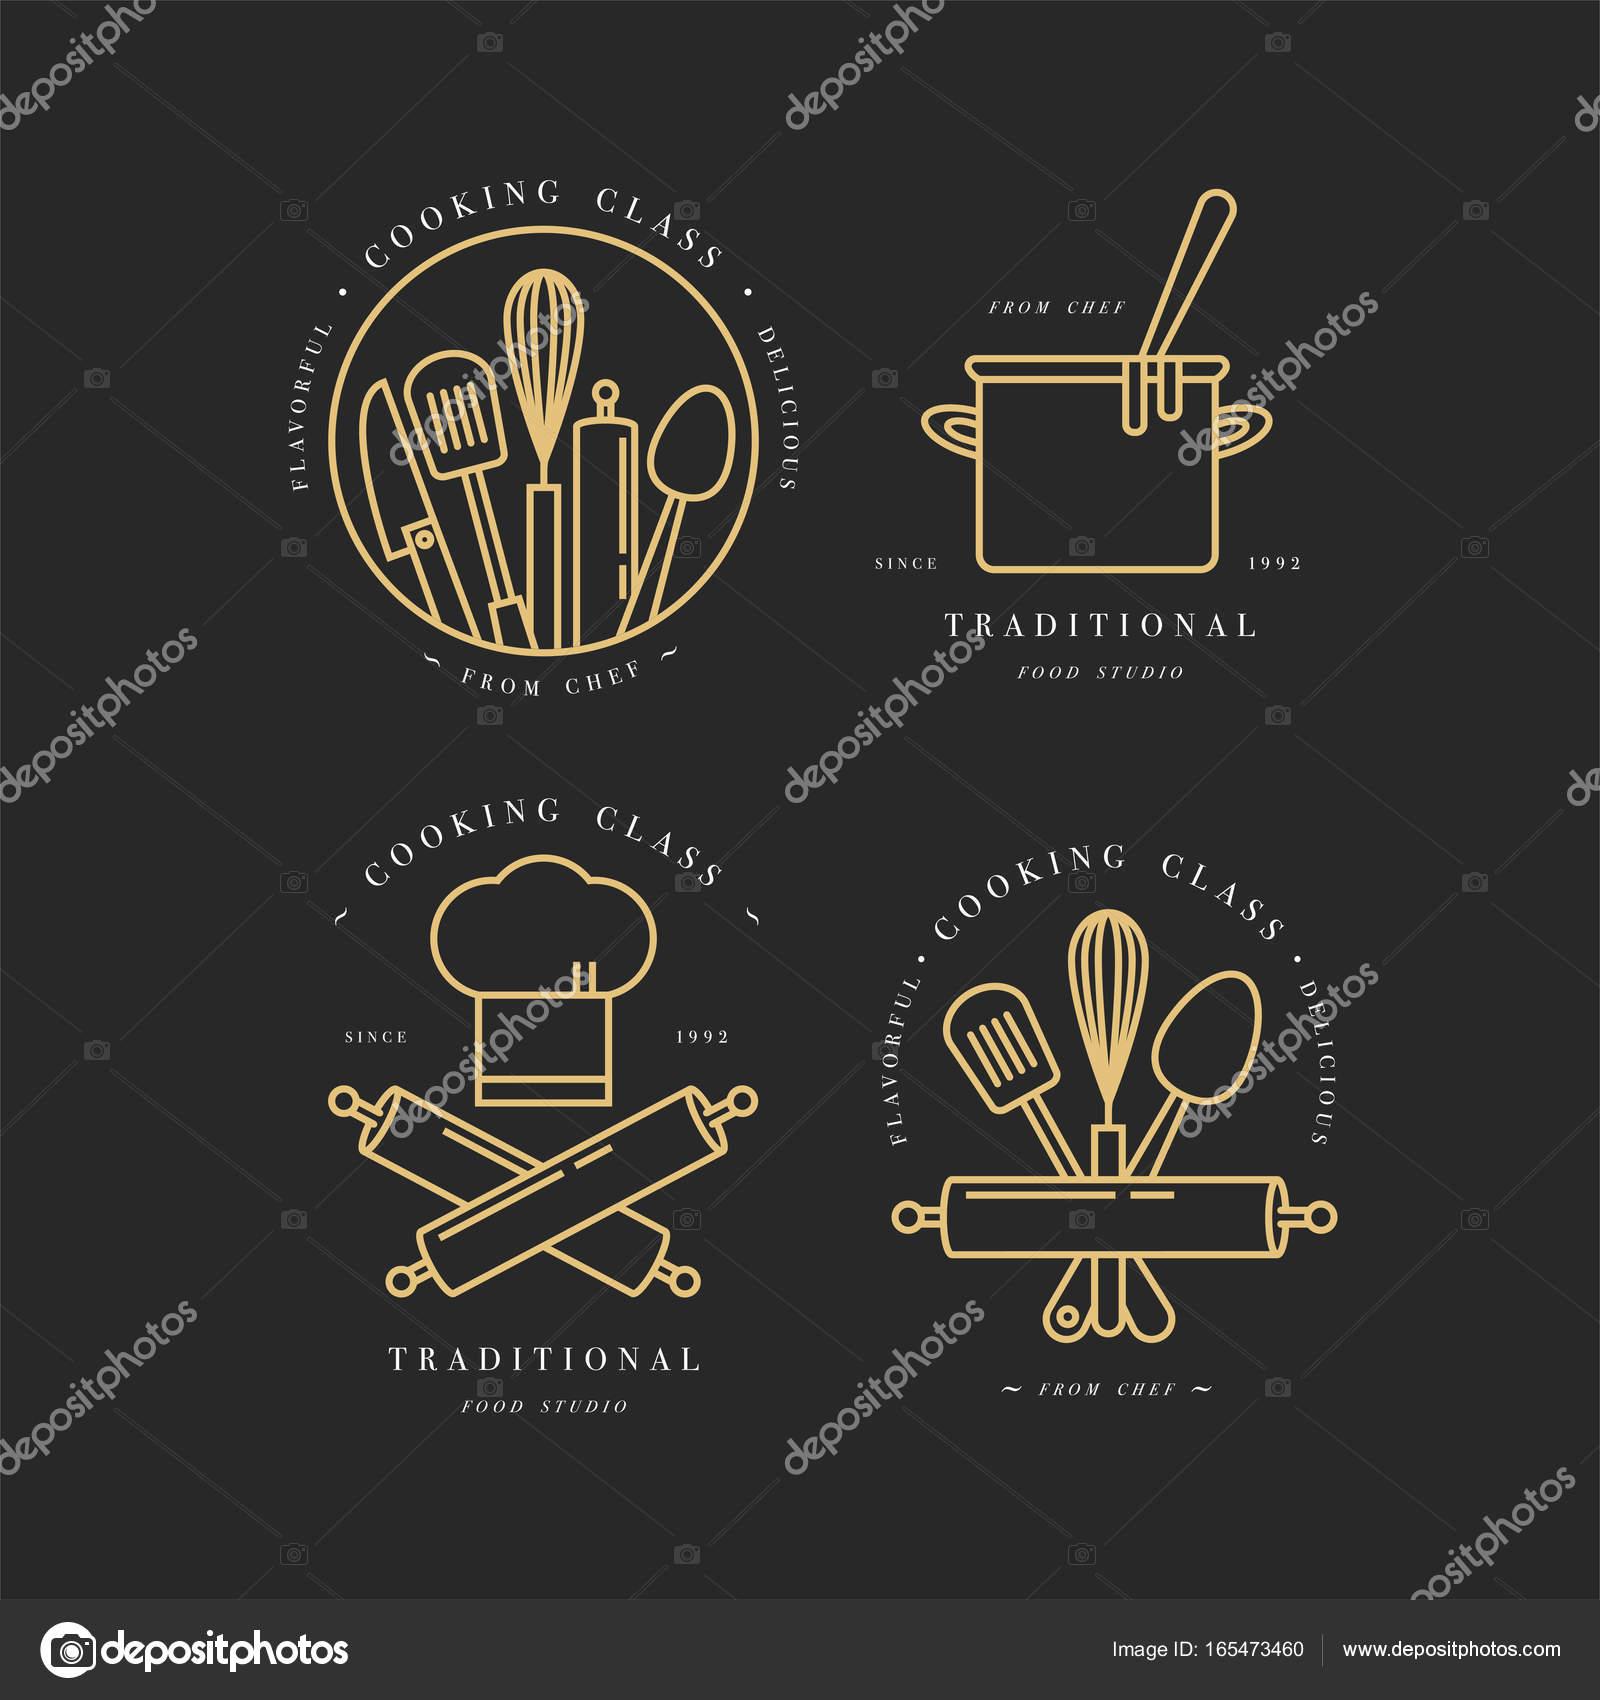 kitchen signs for work countertop soap dispenser 烹饪类线性设计元素 厨房标志 符号 图标或食品工作室标签和徽章 图标或食品工作室